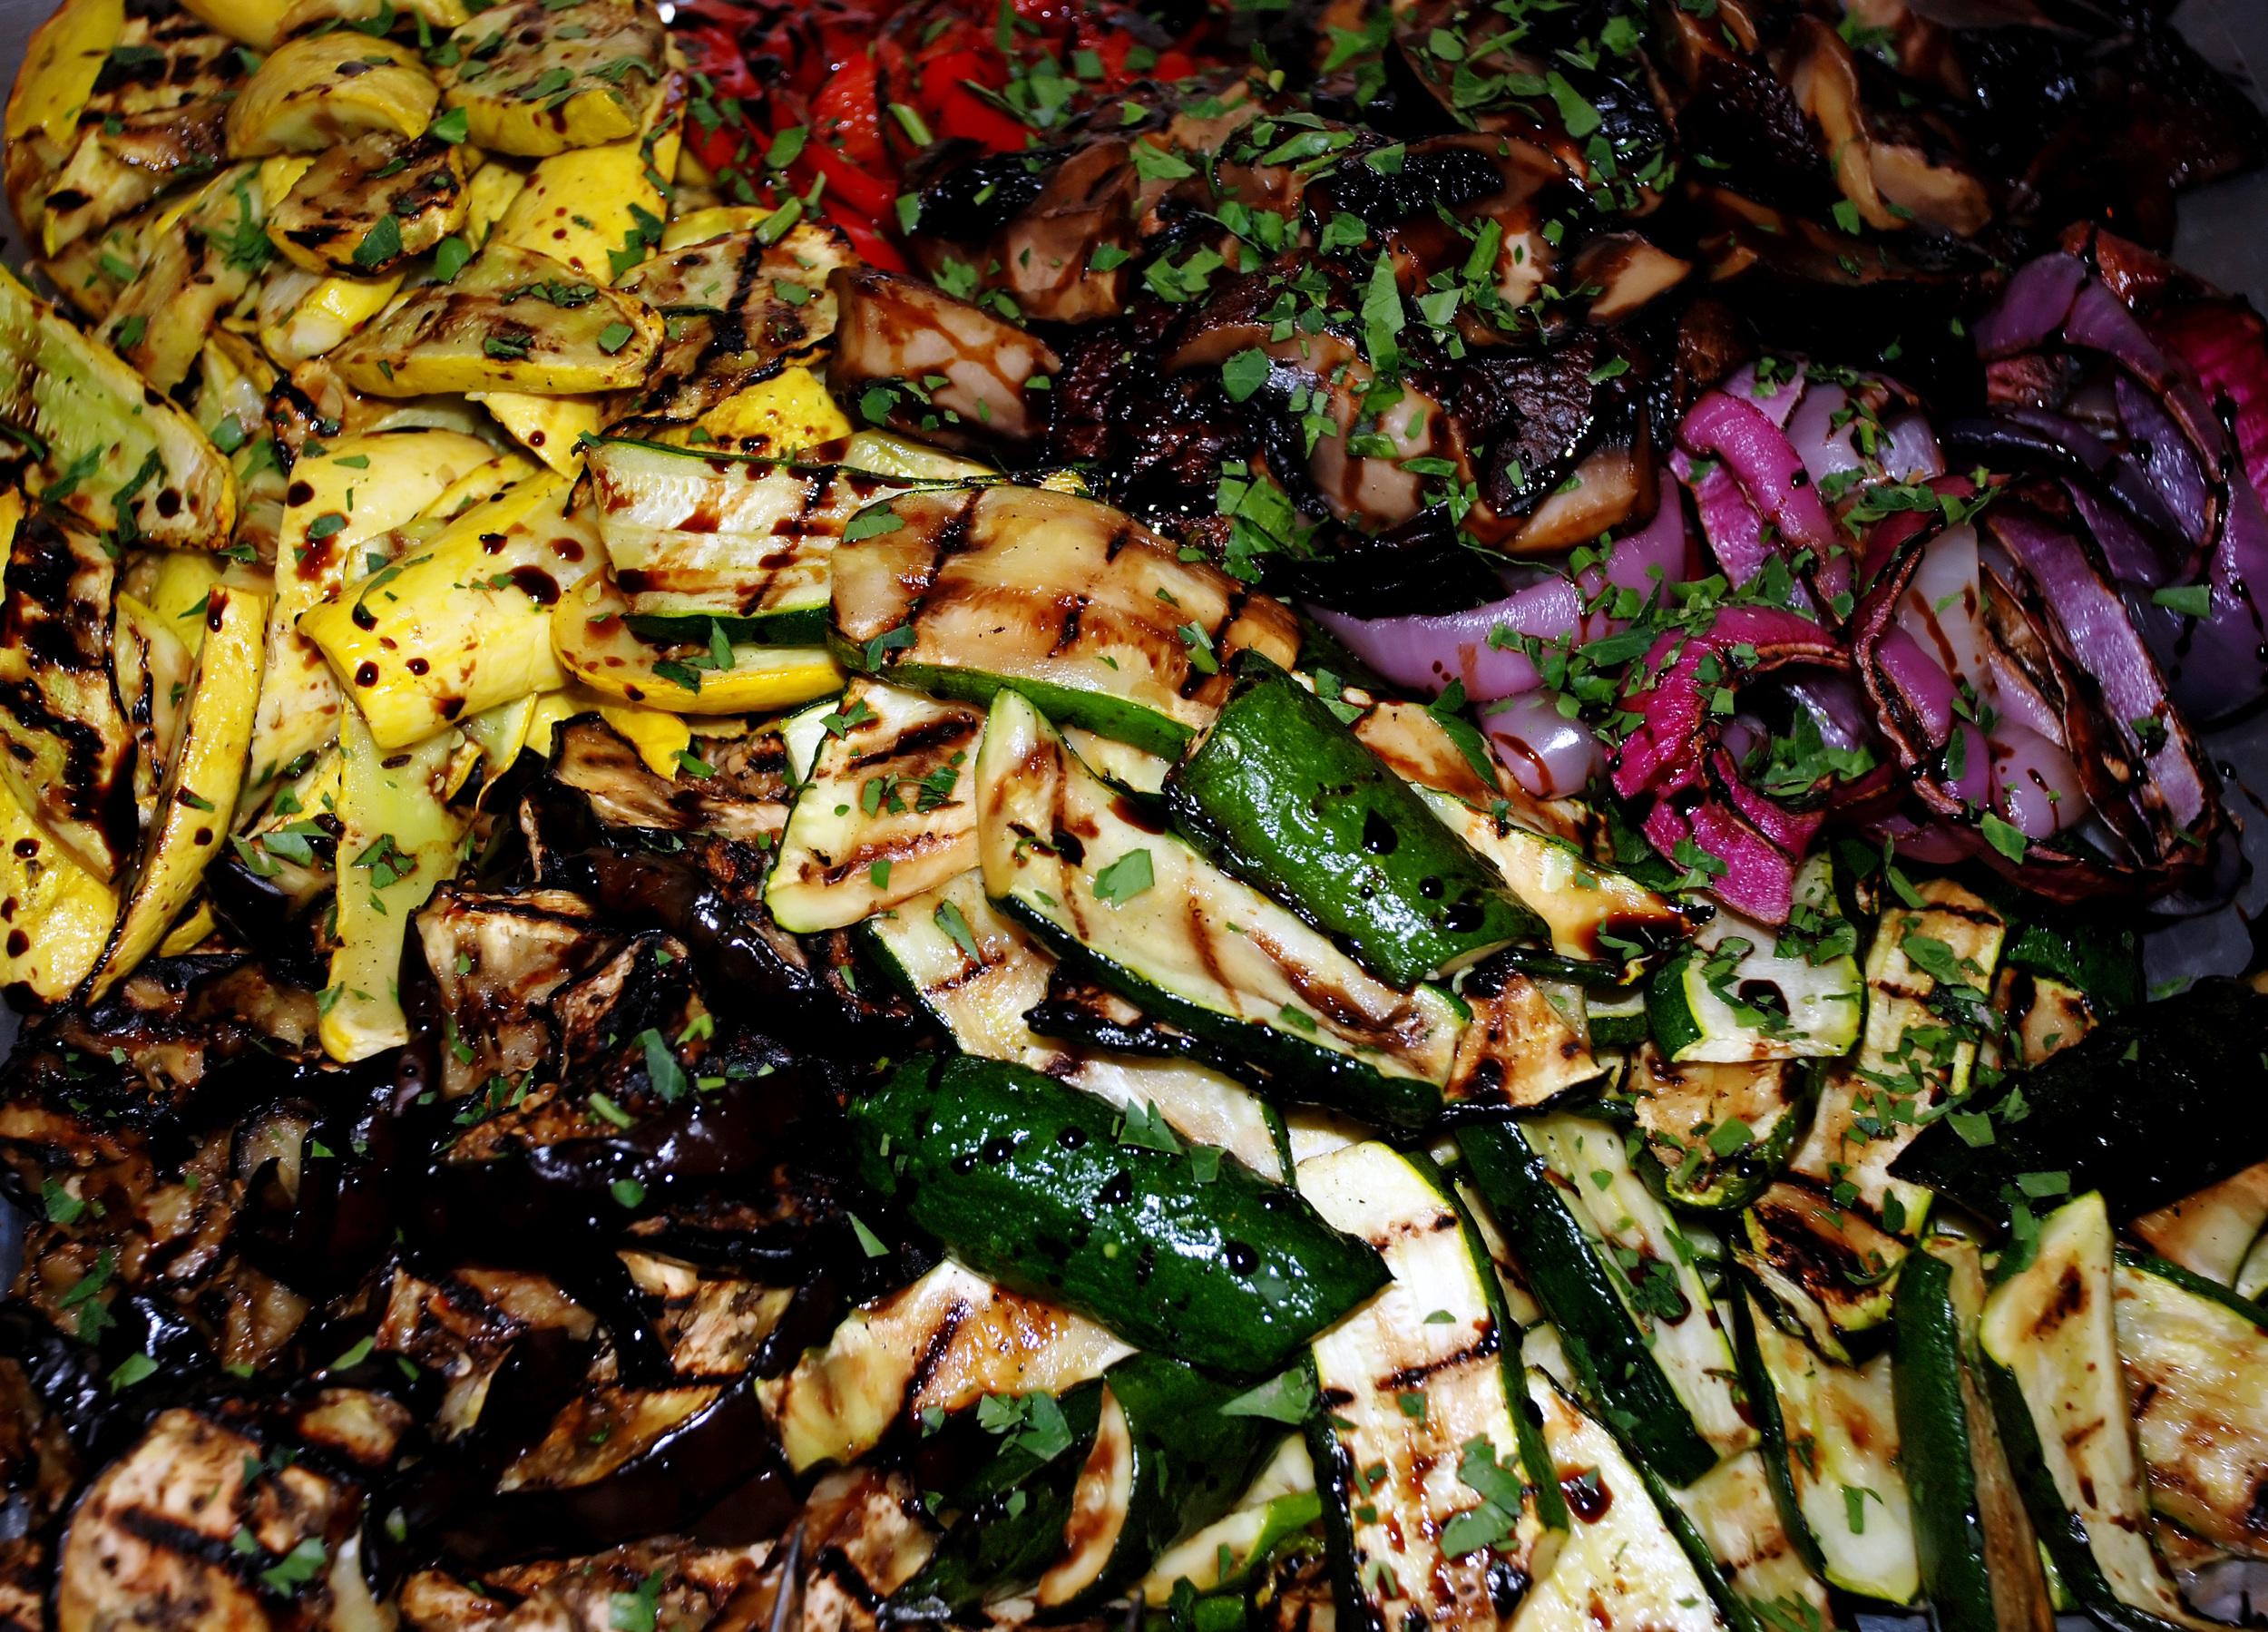 Paulie Spice for Seasoned Veggies